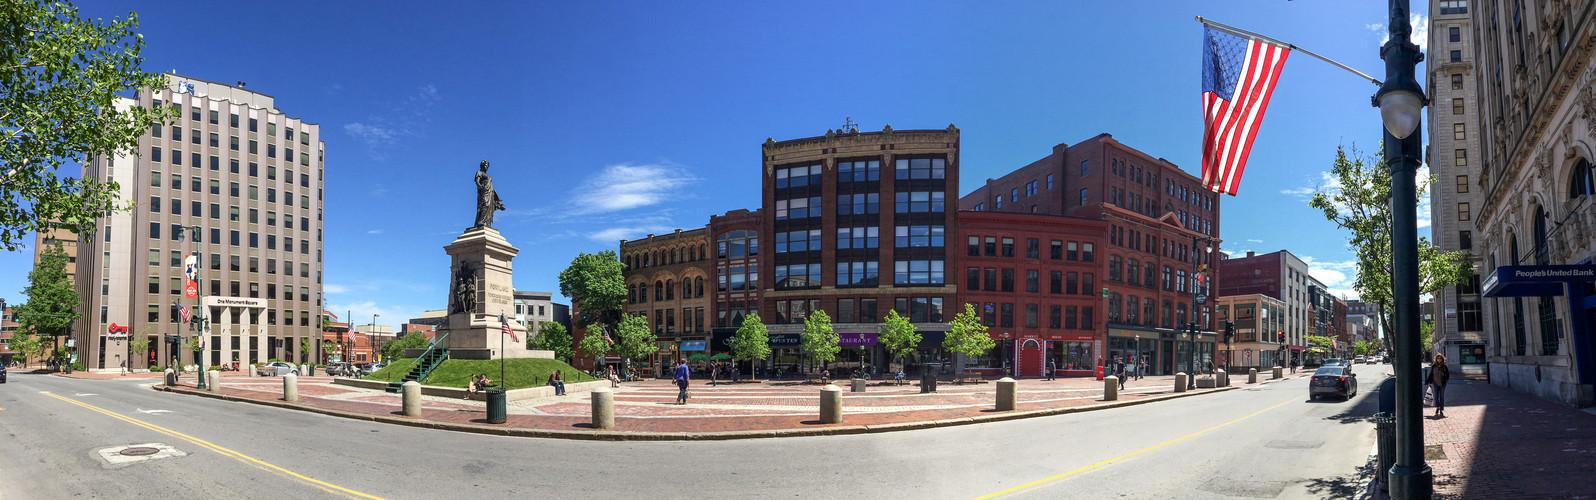 Monument_Square_panorama,_Portland_Maine